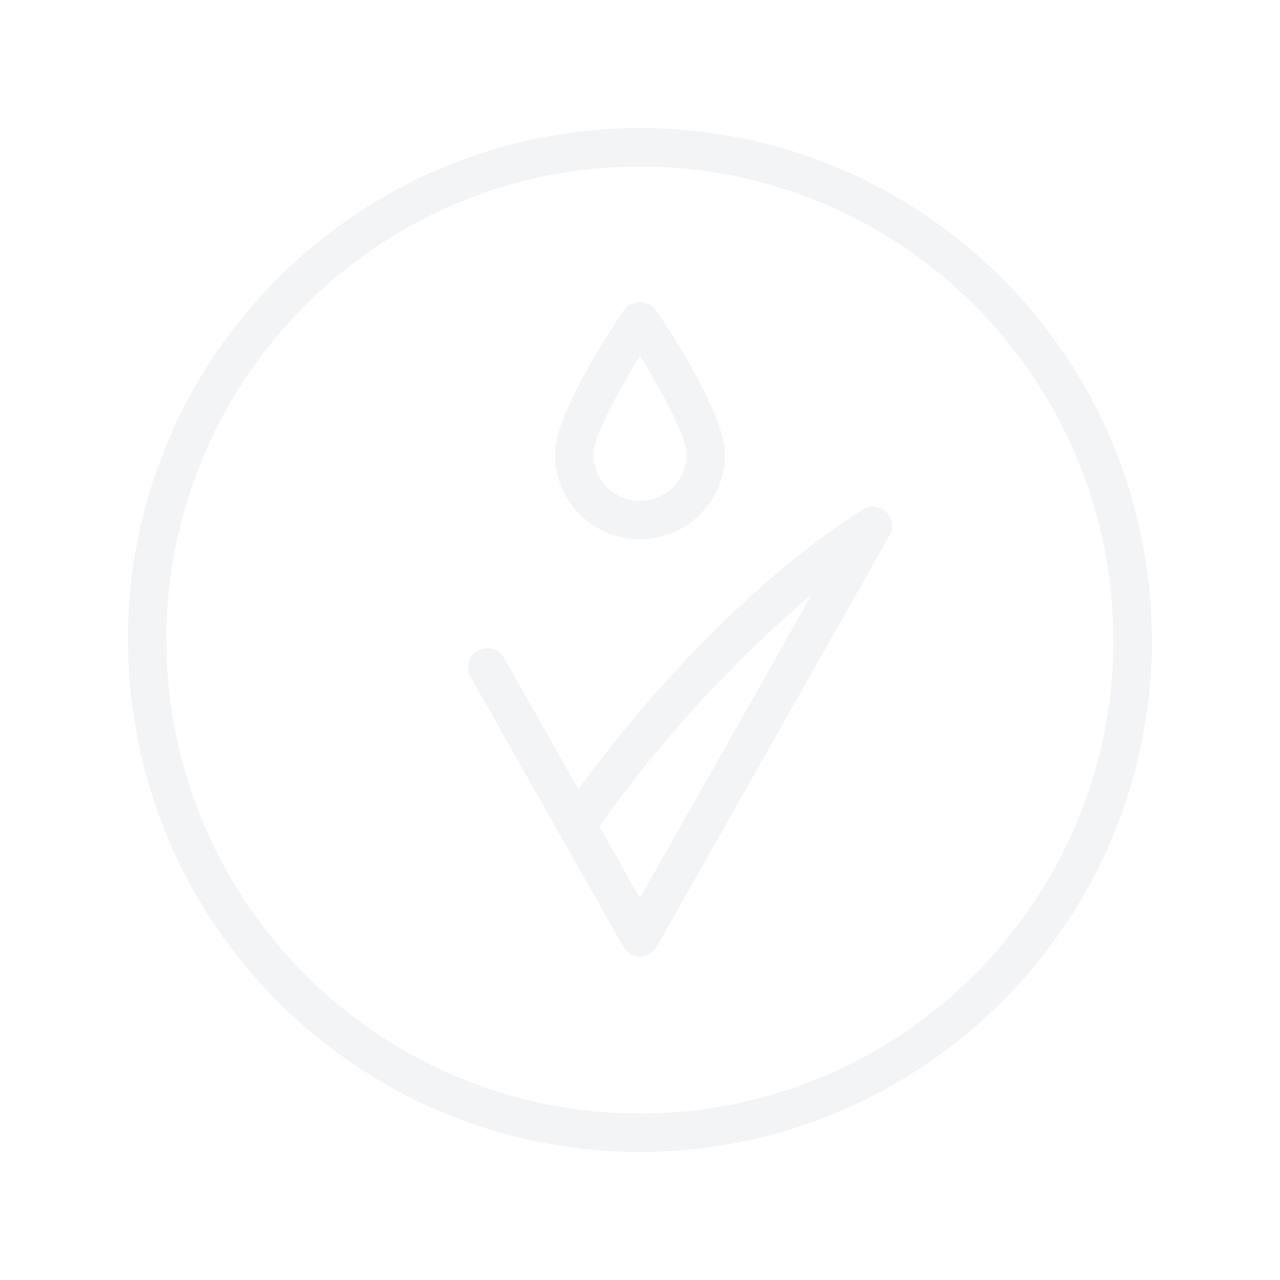 JOICO Vero K-Pak Color Intensity Orchid 118ml